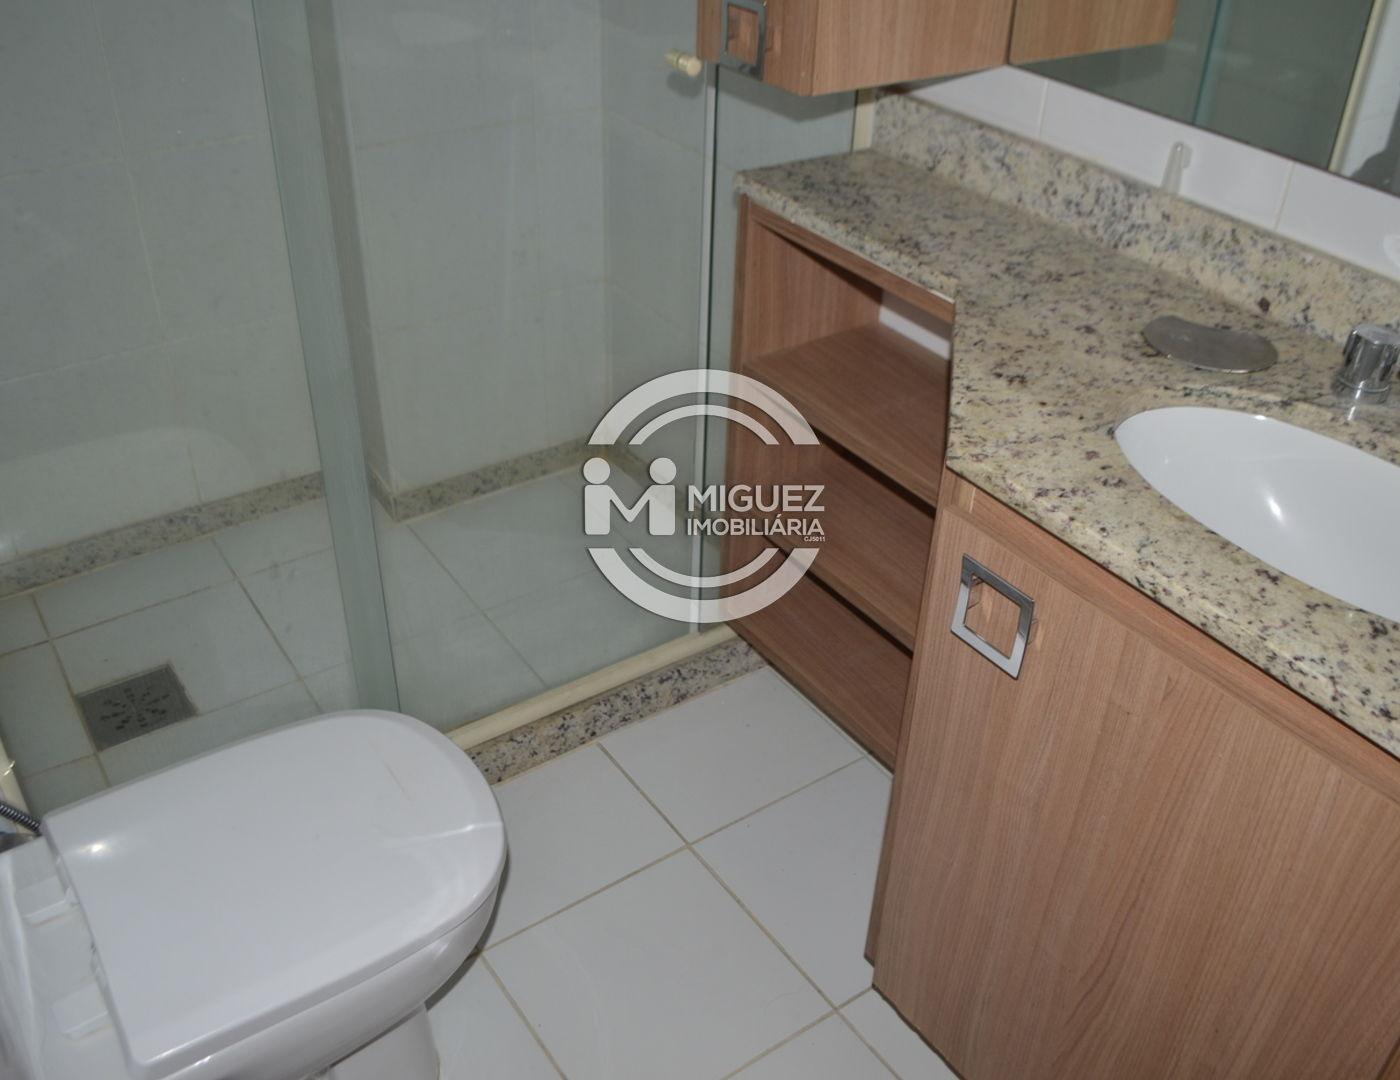 Apartamento, venda, Rua Visconde de Cabo Frio - Tijuca , Rio de janeiro